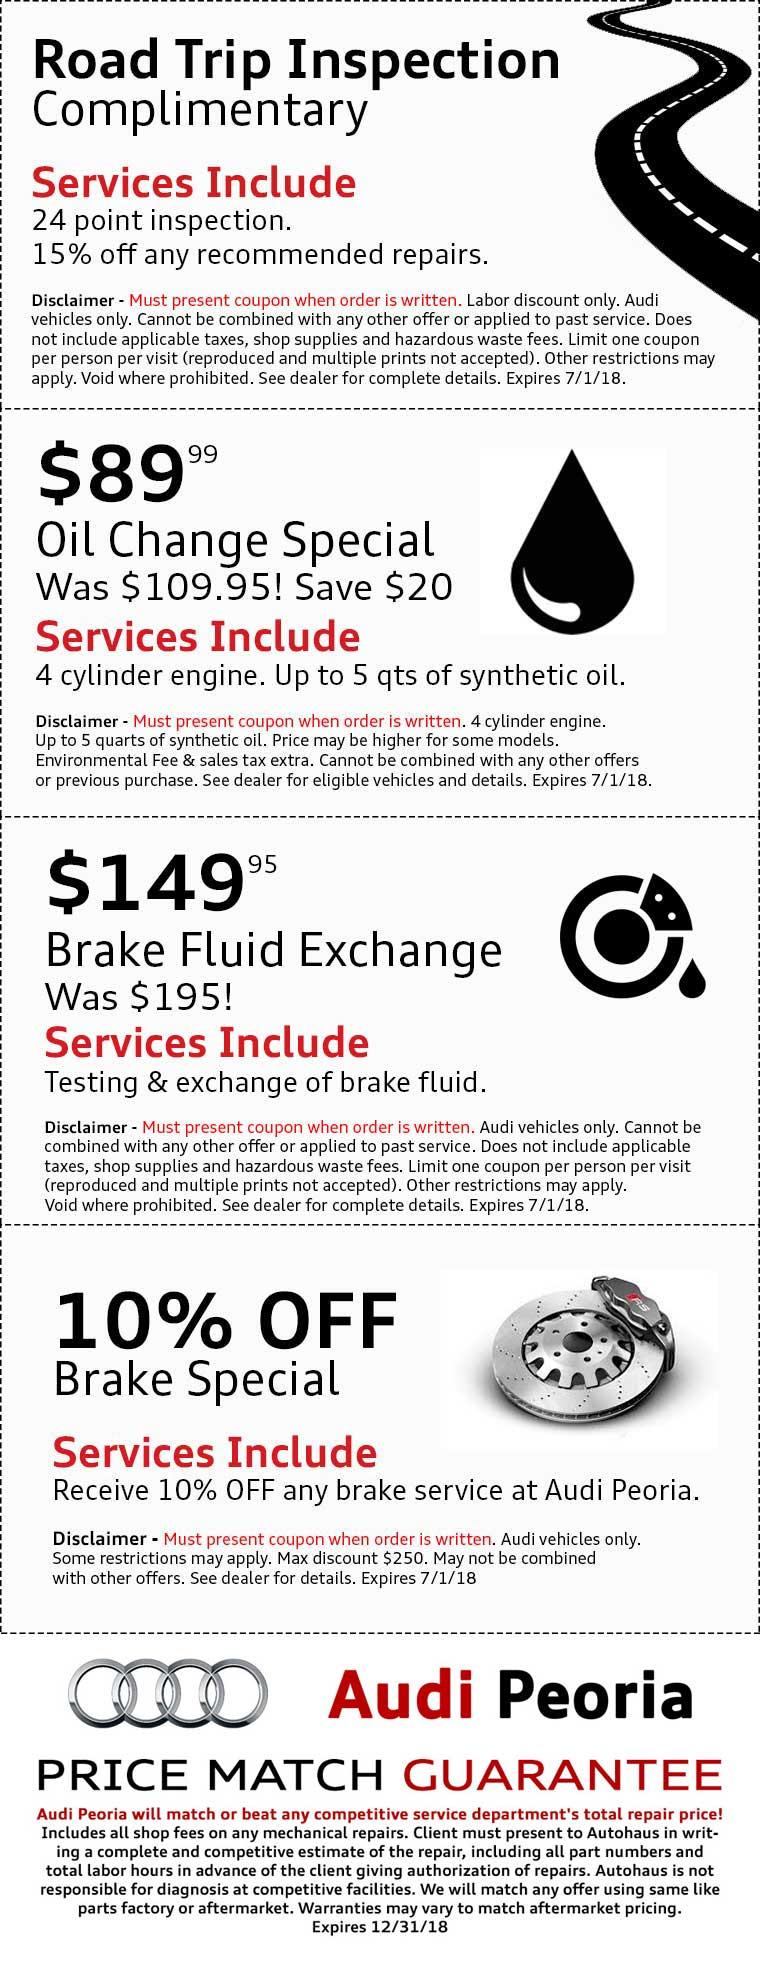 audi parts berglund bgb change landingpage at specials auto va service coupon htm and oil